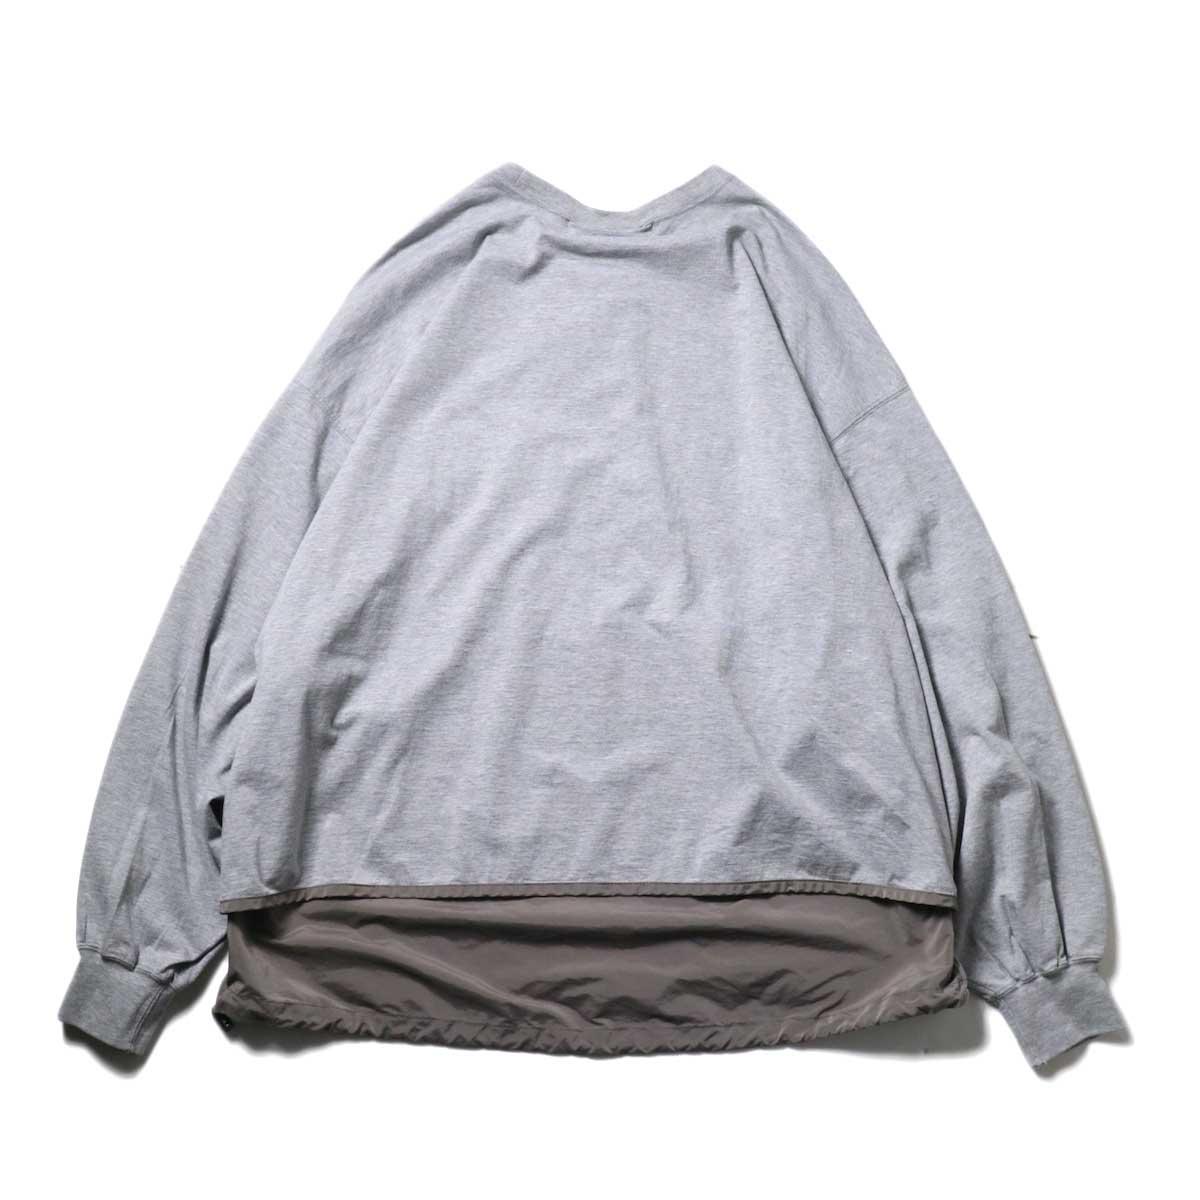 REMI RELIEF / ブリーフィング 30/天竺ベンチレーションロンT (Gray)背面